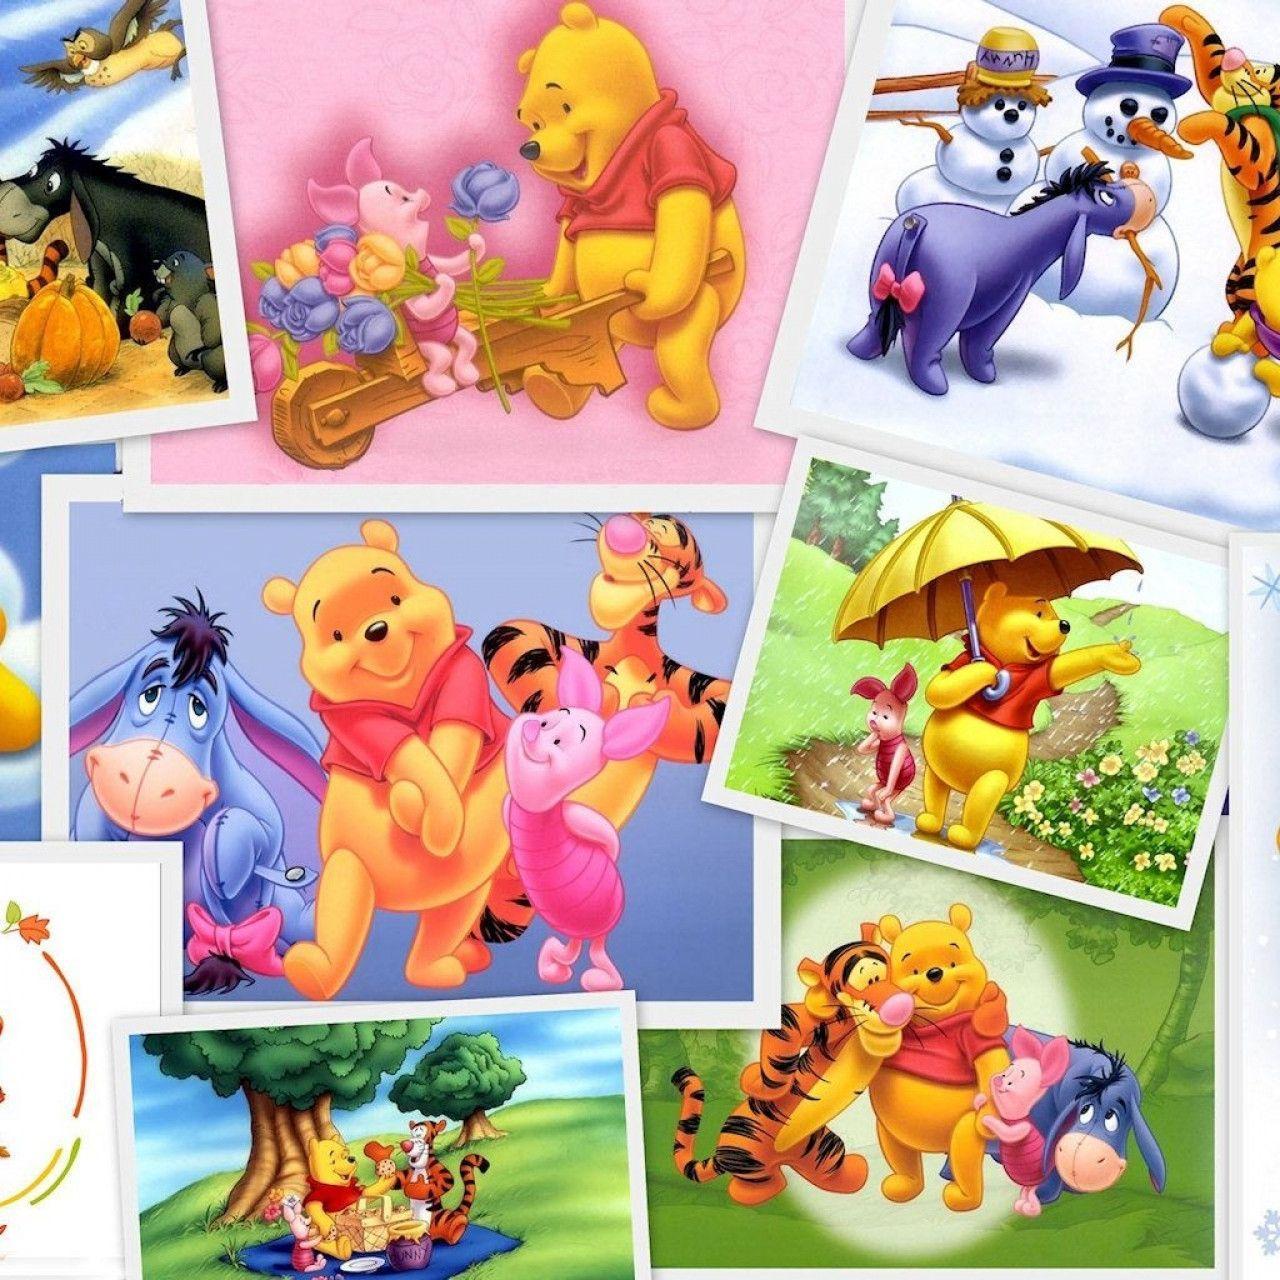 Pooh bear desktop wallpapers wallpaper cave winnie pooh wallpaper free download voltagebd Images